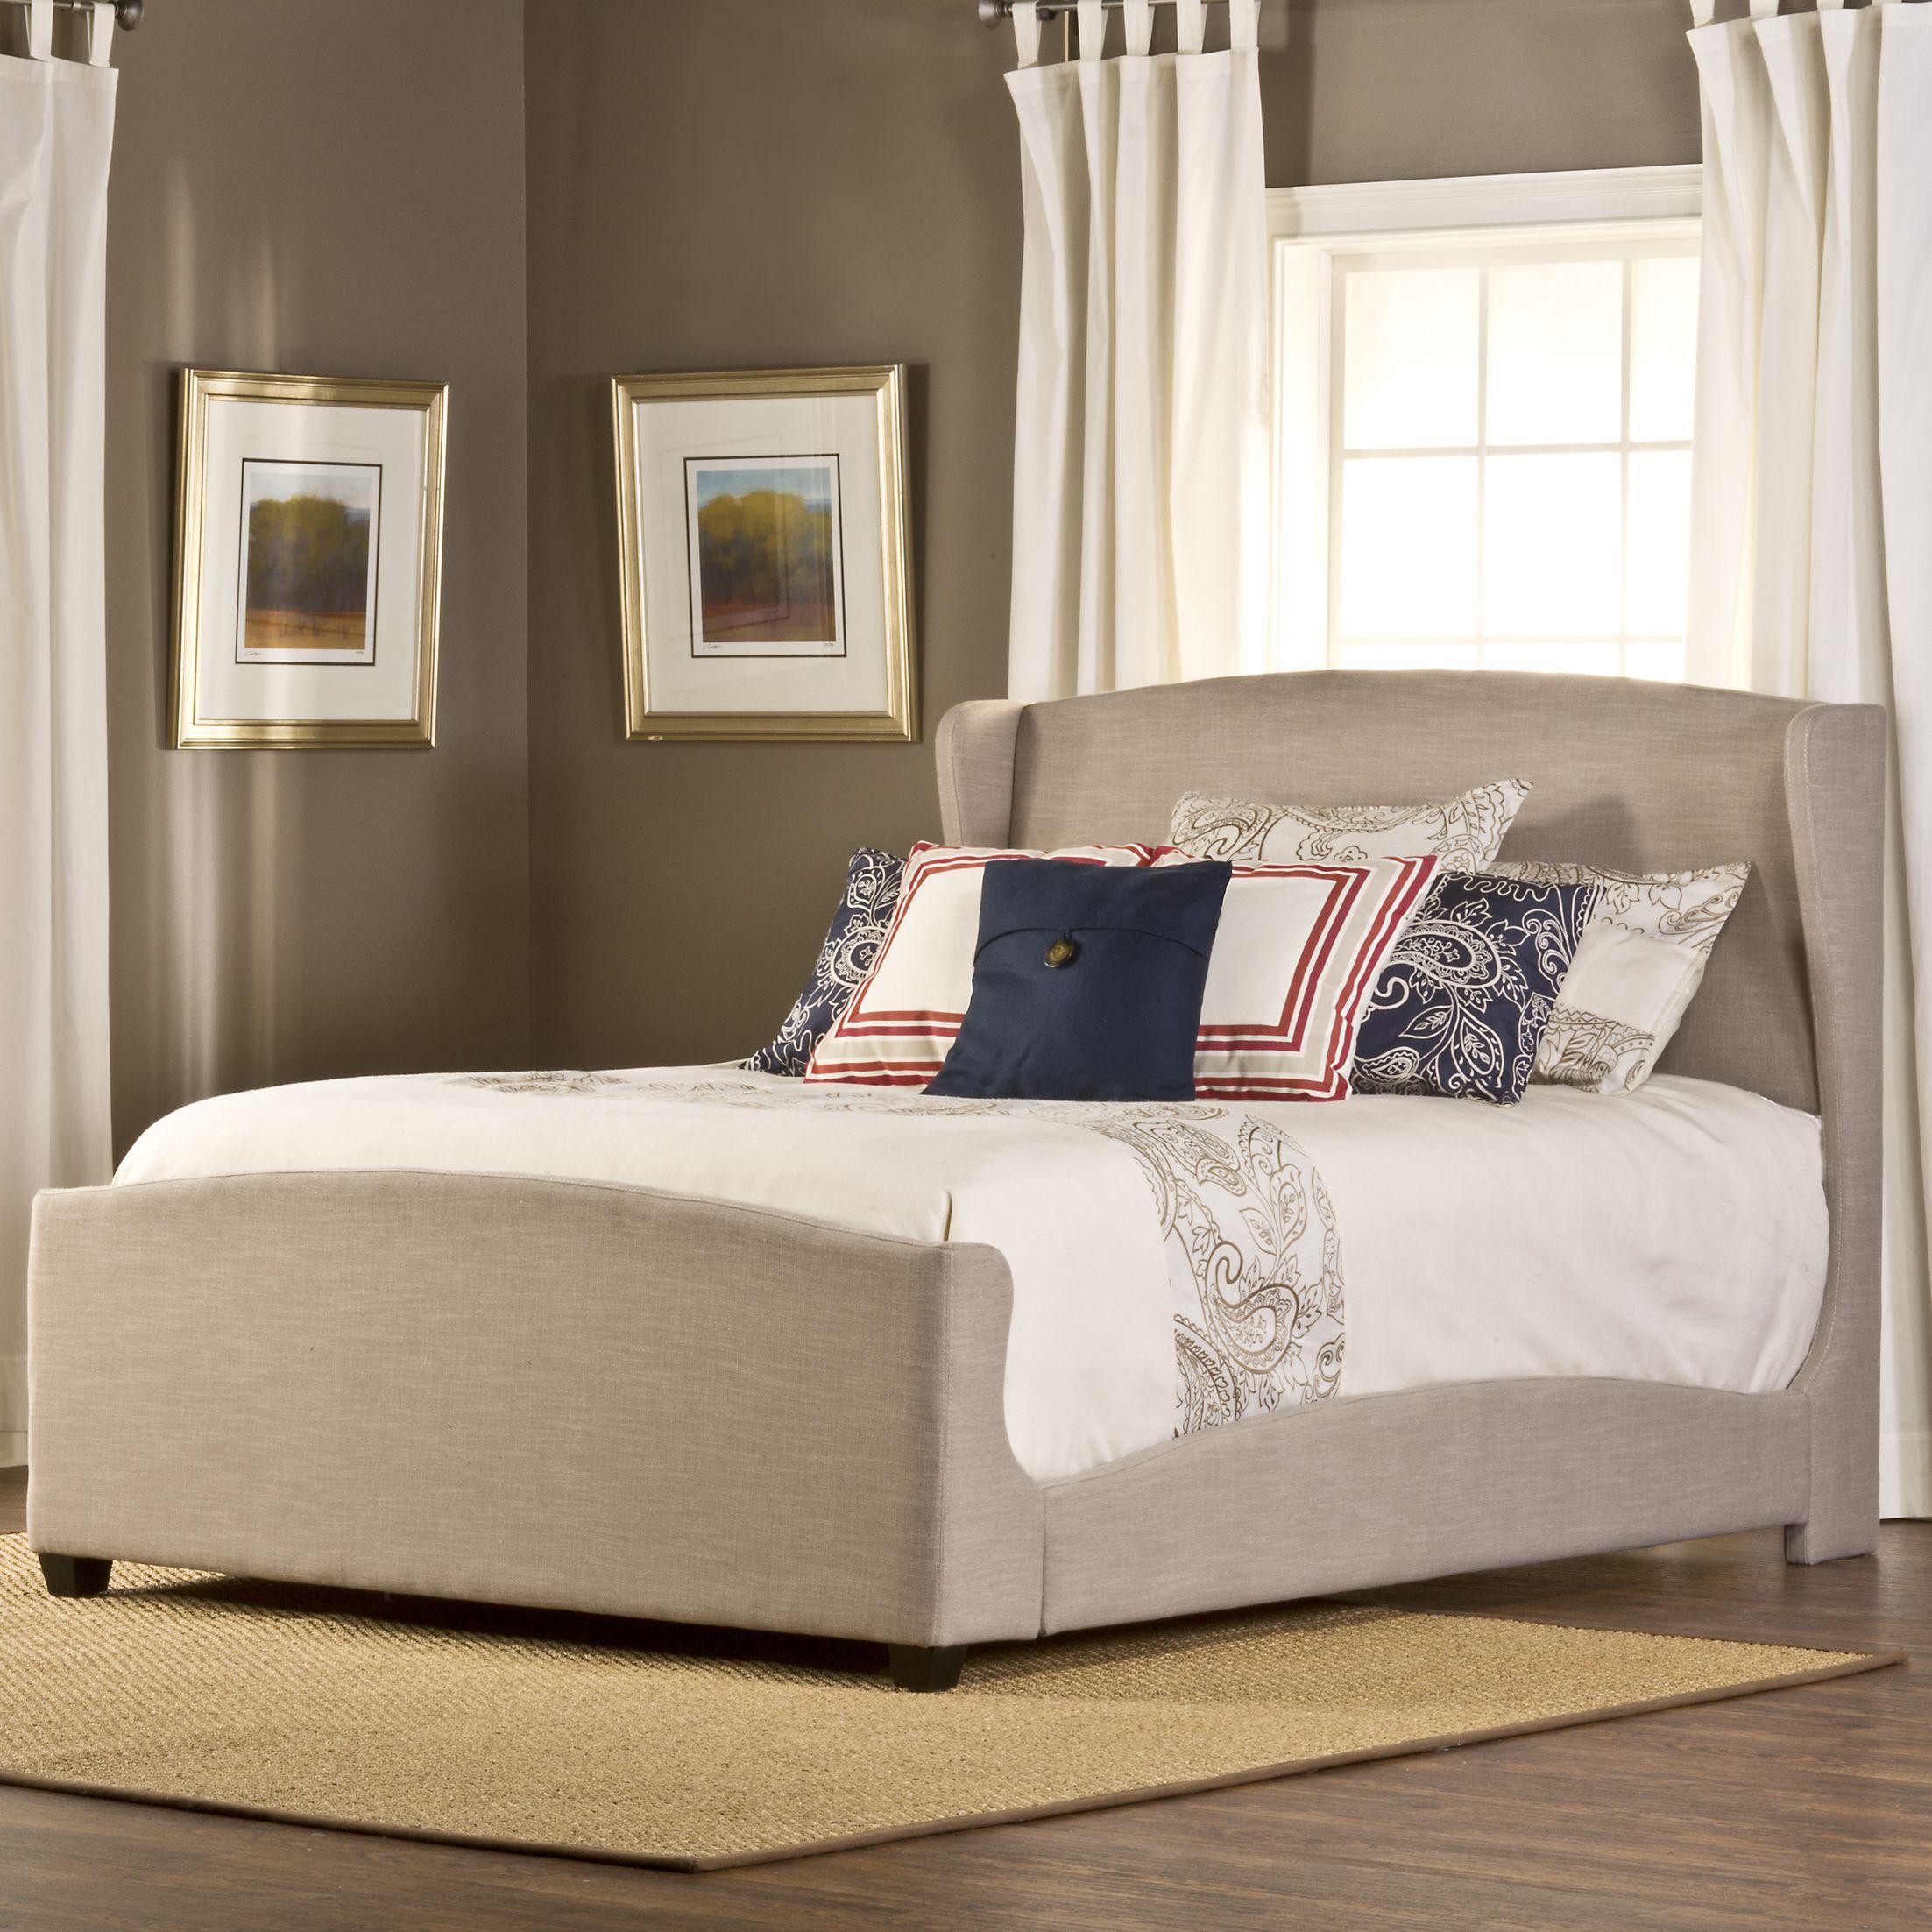 Master bedroom king size bed designs  Barrington Wingback Bed  Ideas for master bedroom  Pinterest